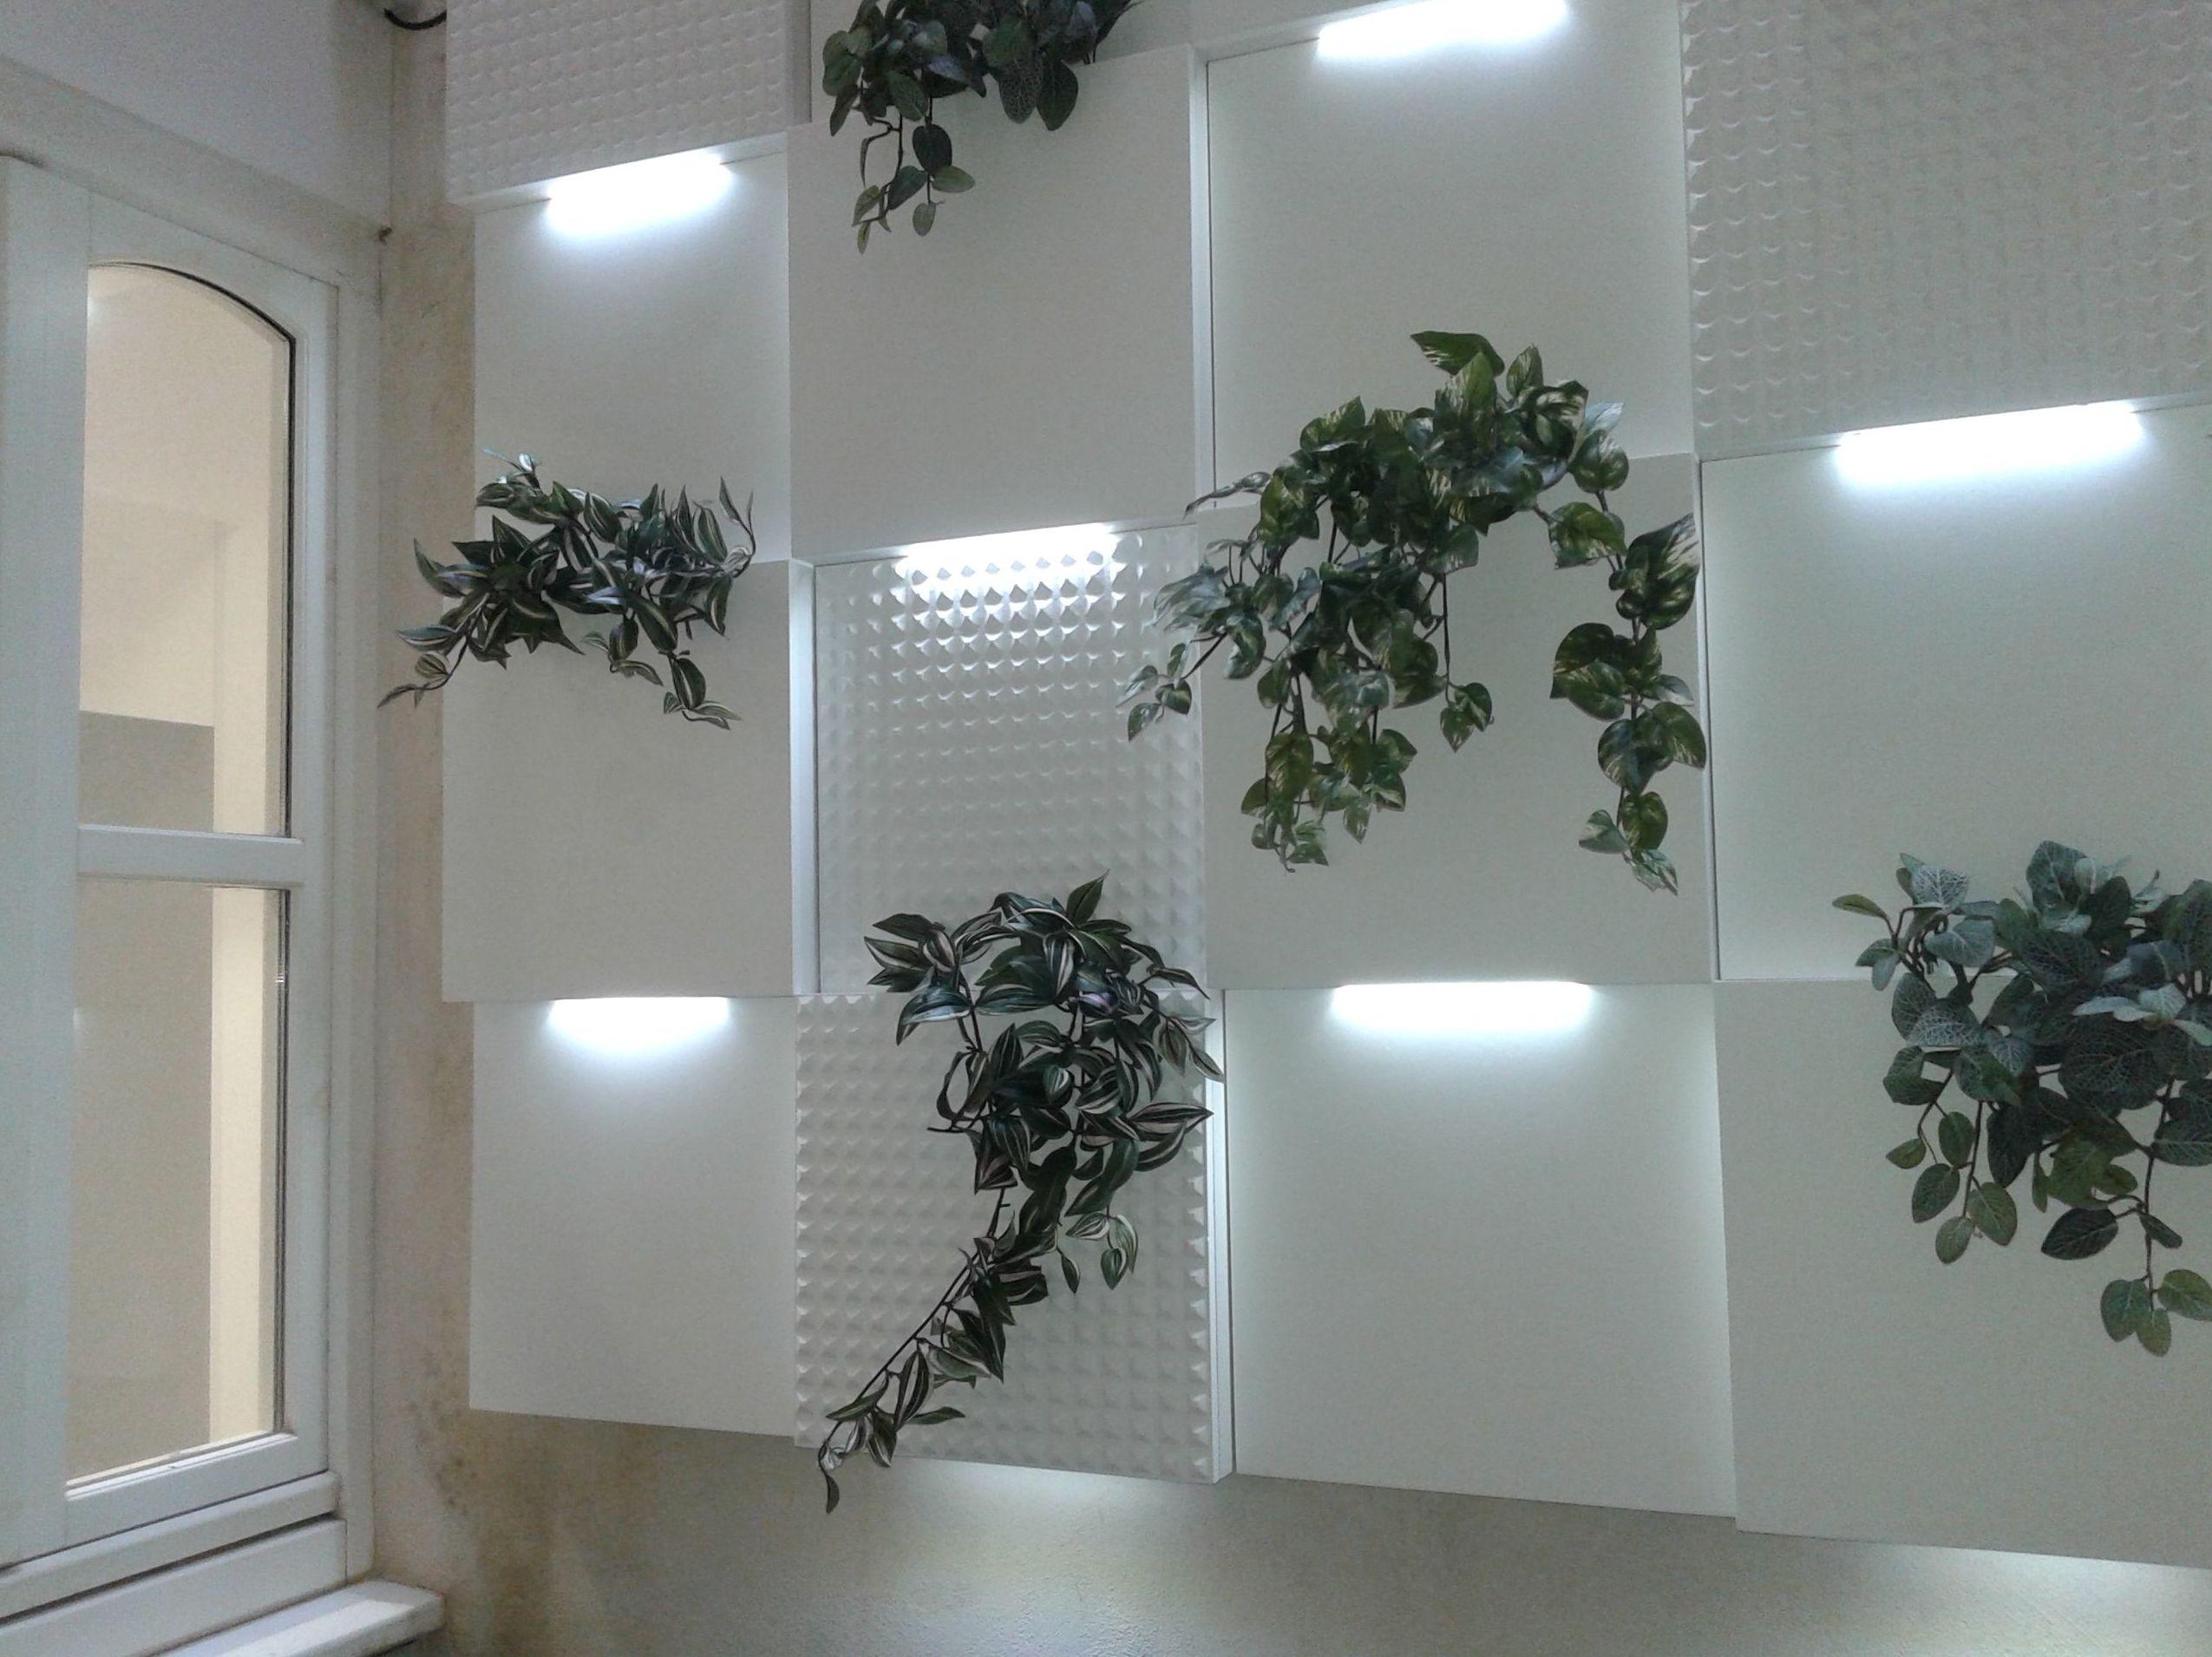 Javier Perez dentista - Jardín vertical